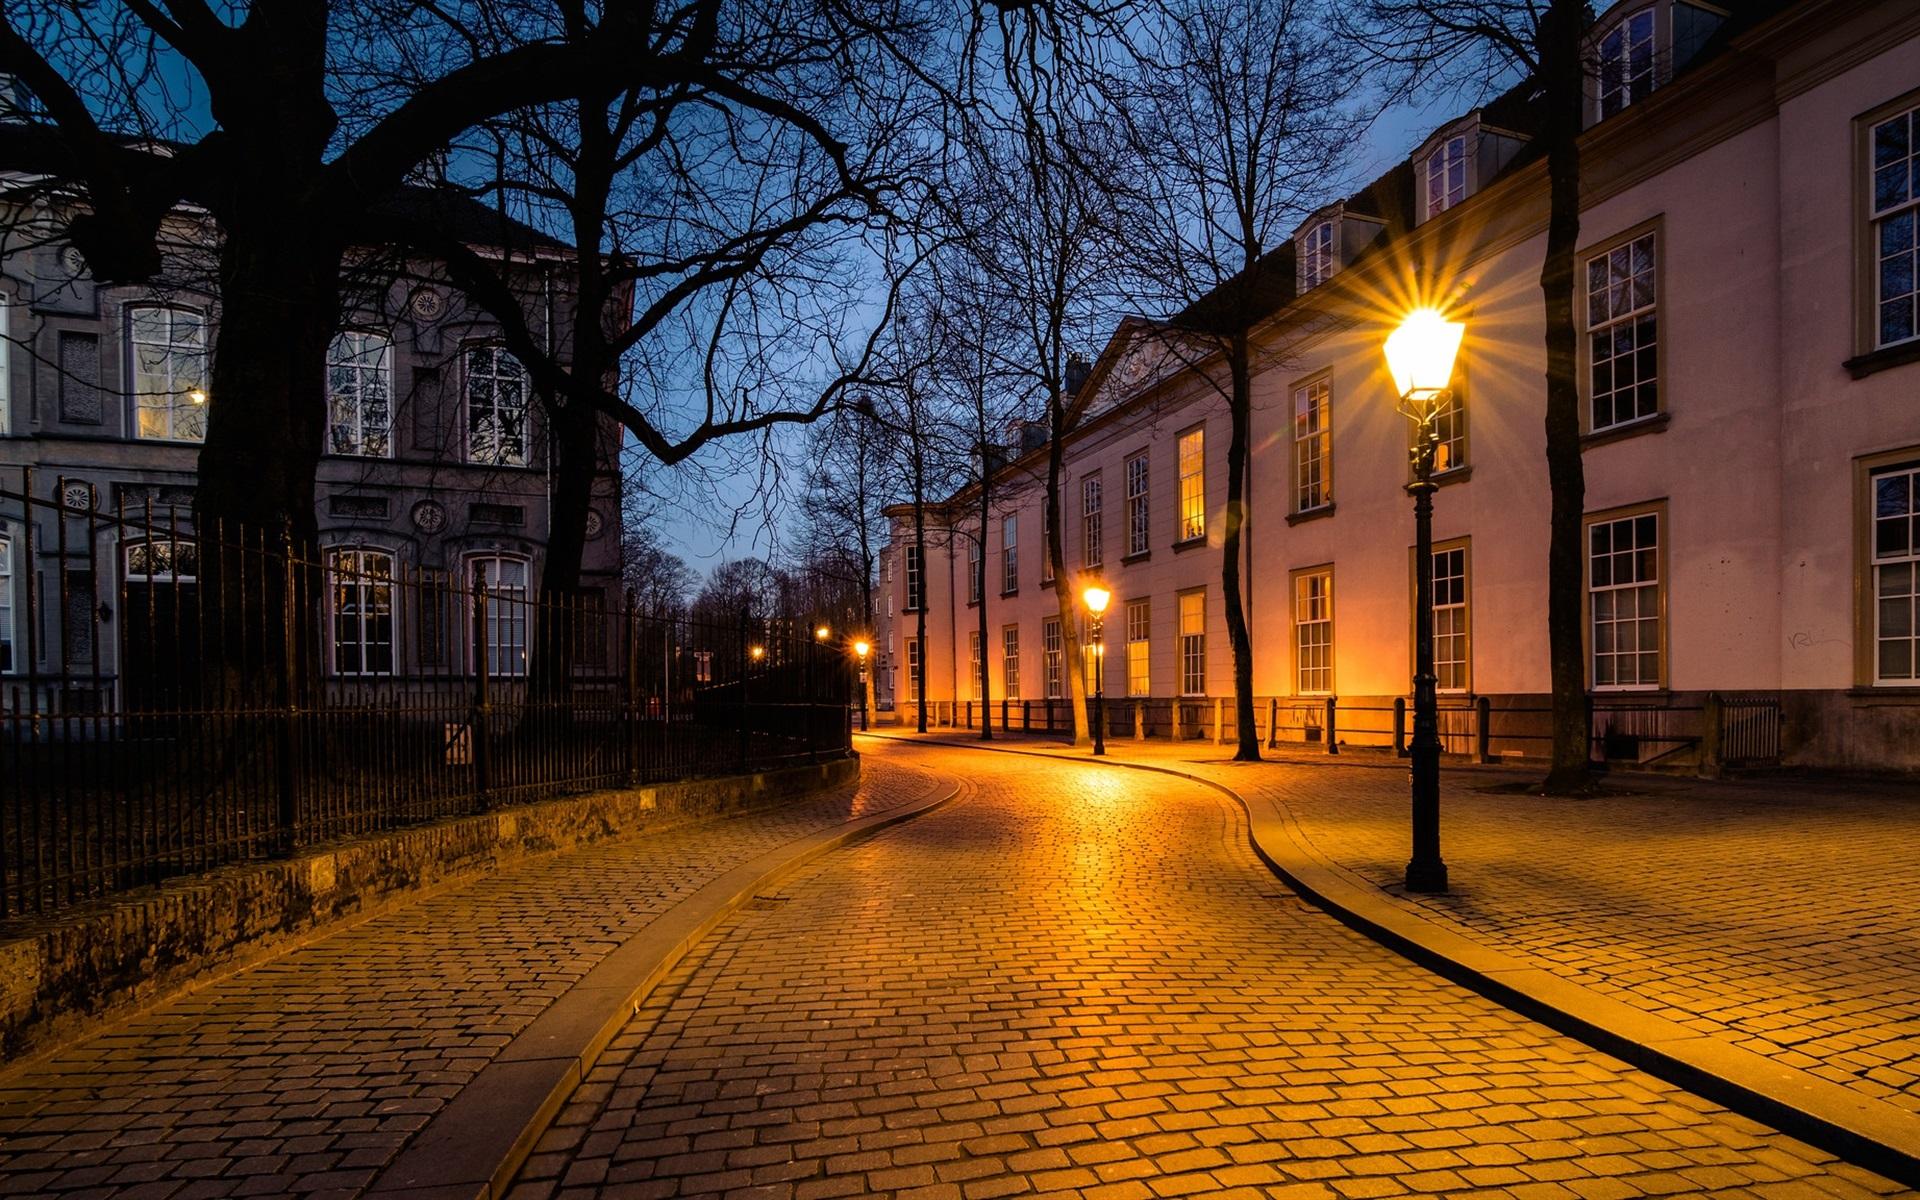 Картинка ночью на улице